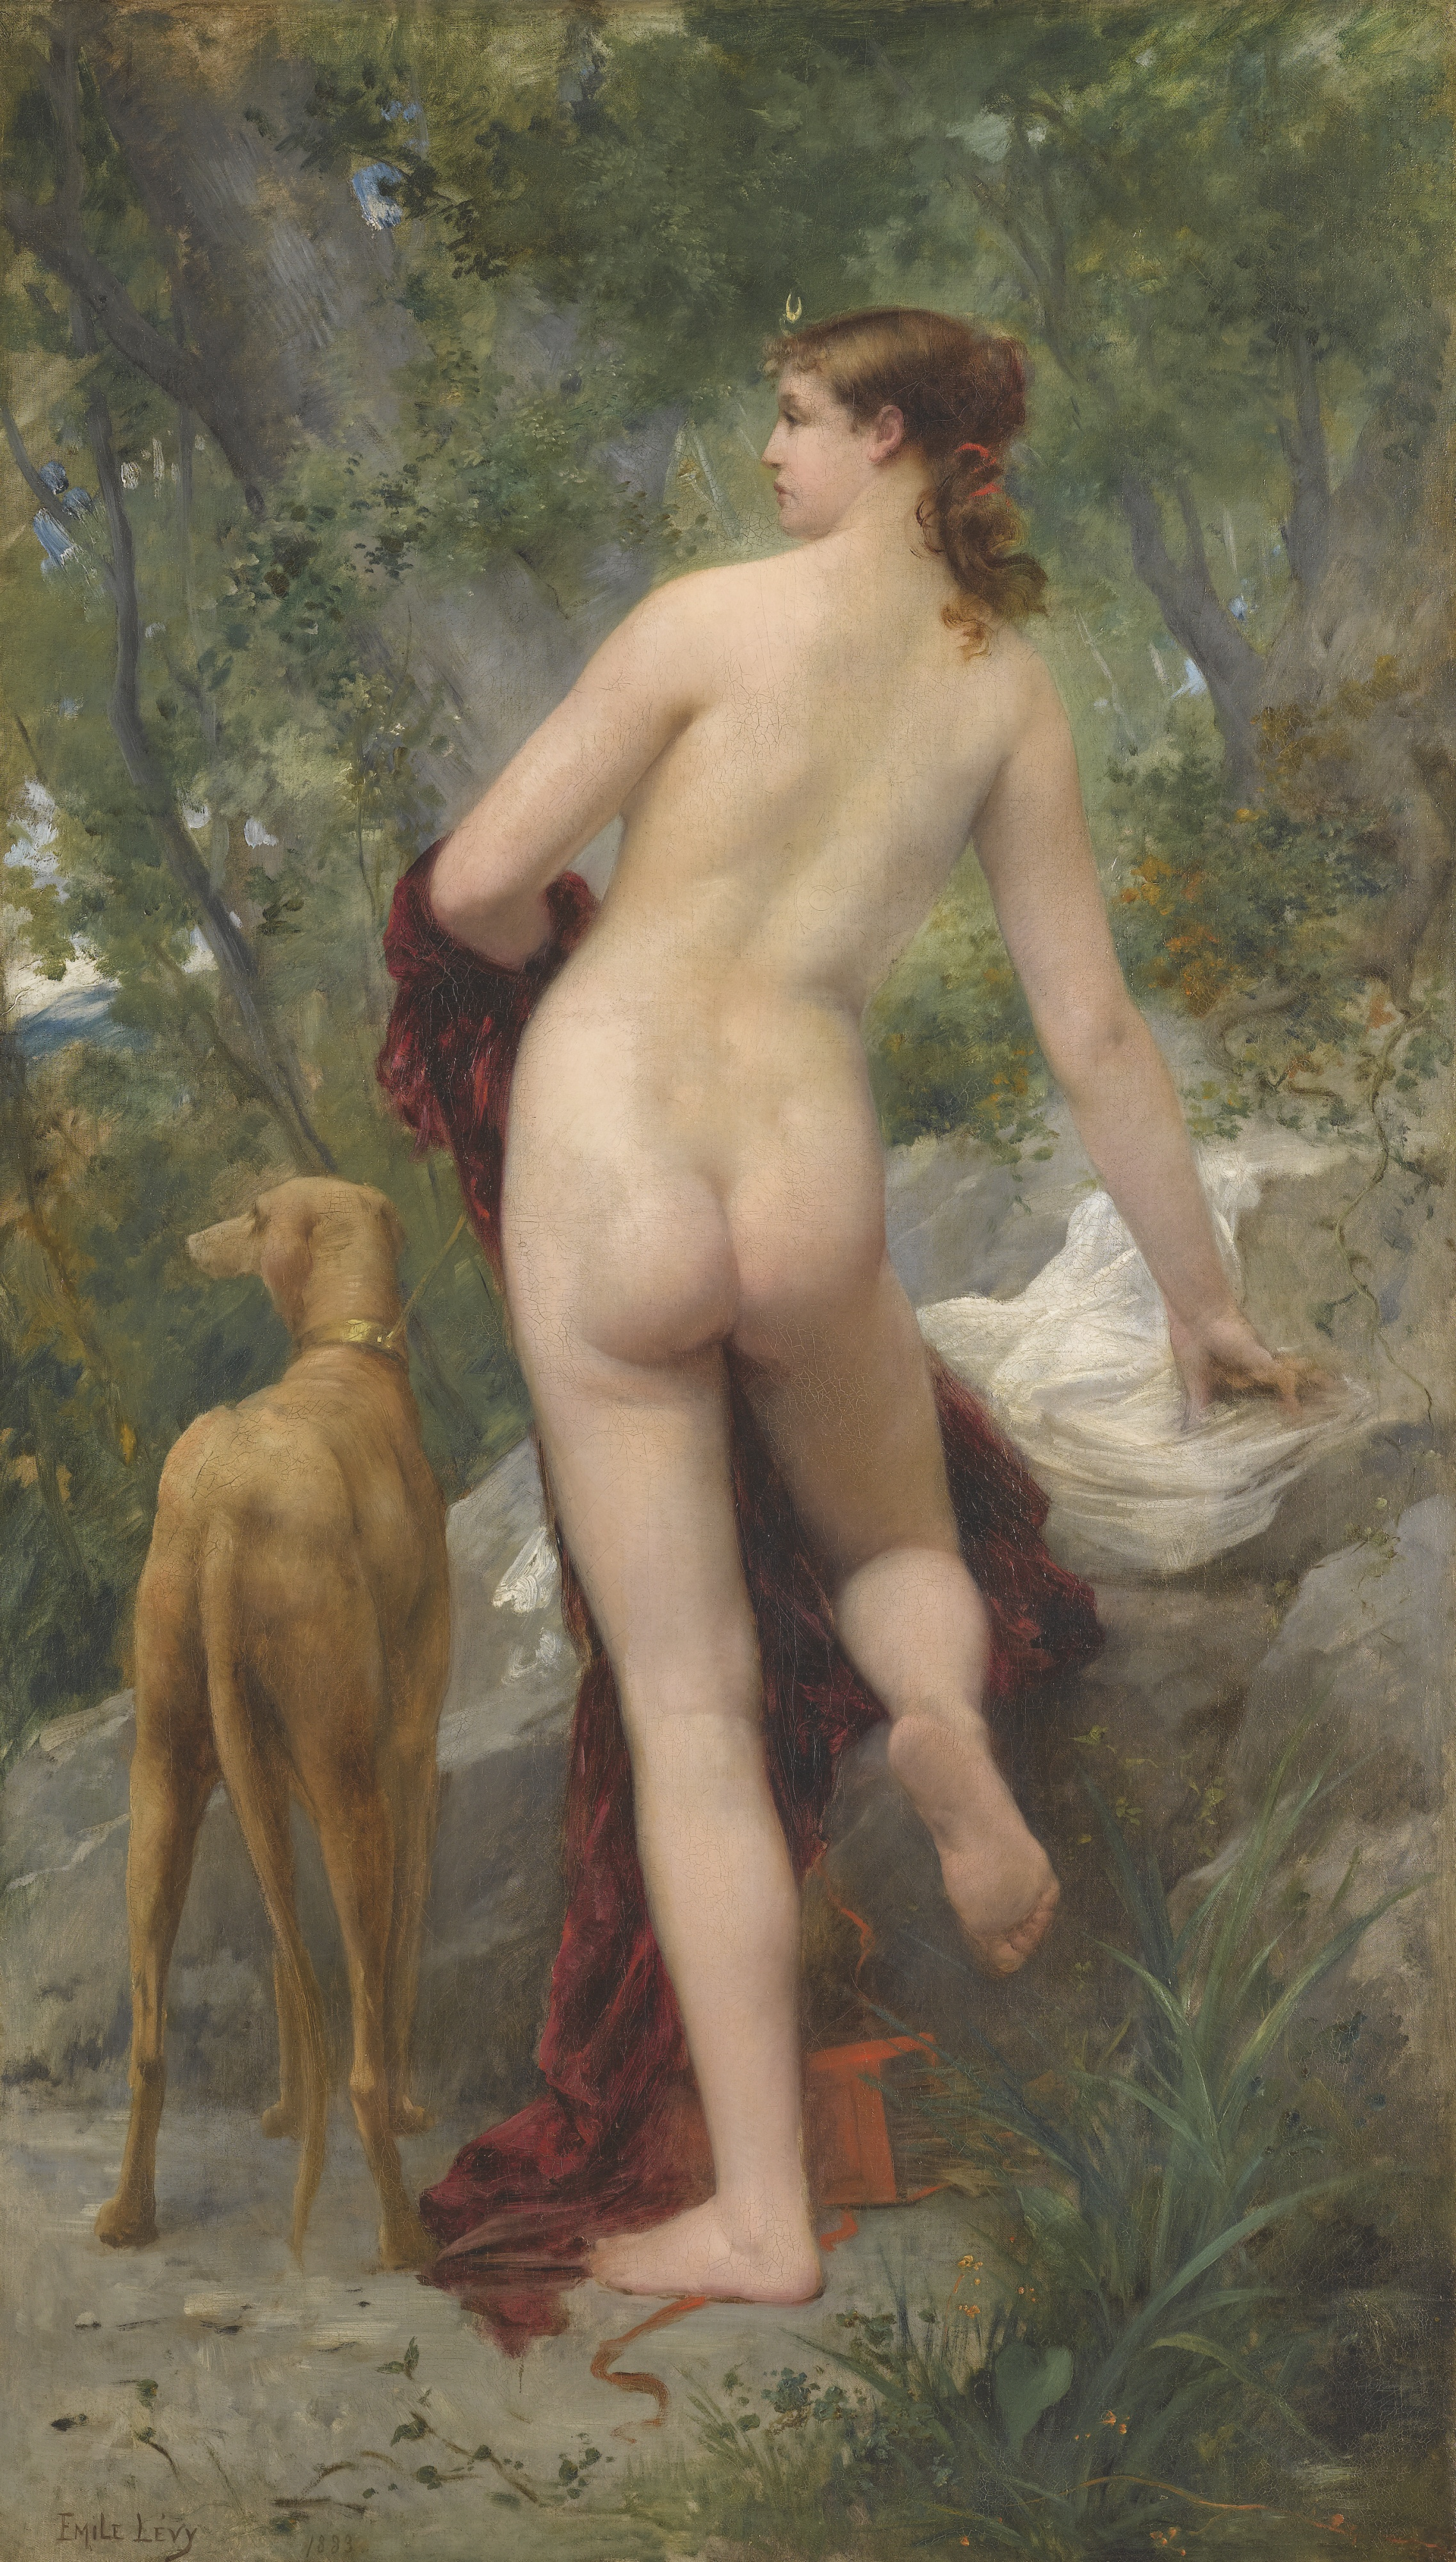 Emile Levy, 1826-1890. Диана в лесу. 107 х 61 см. Частная коллекция